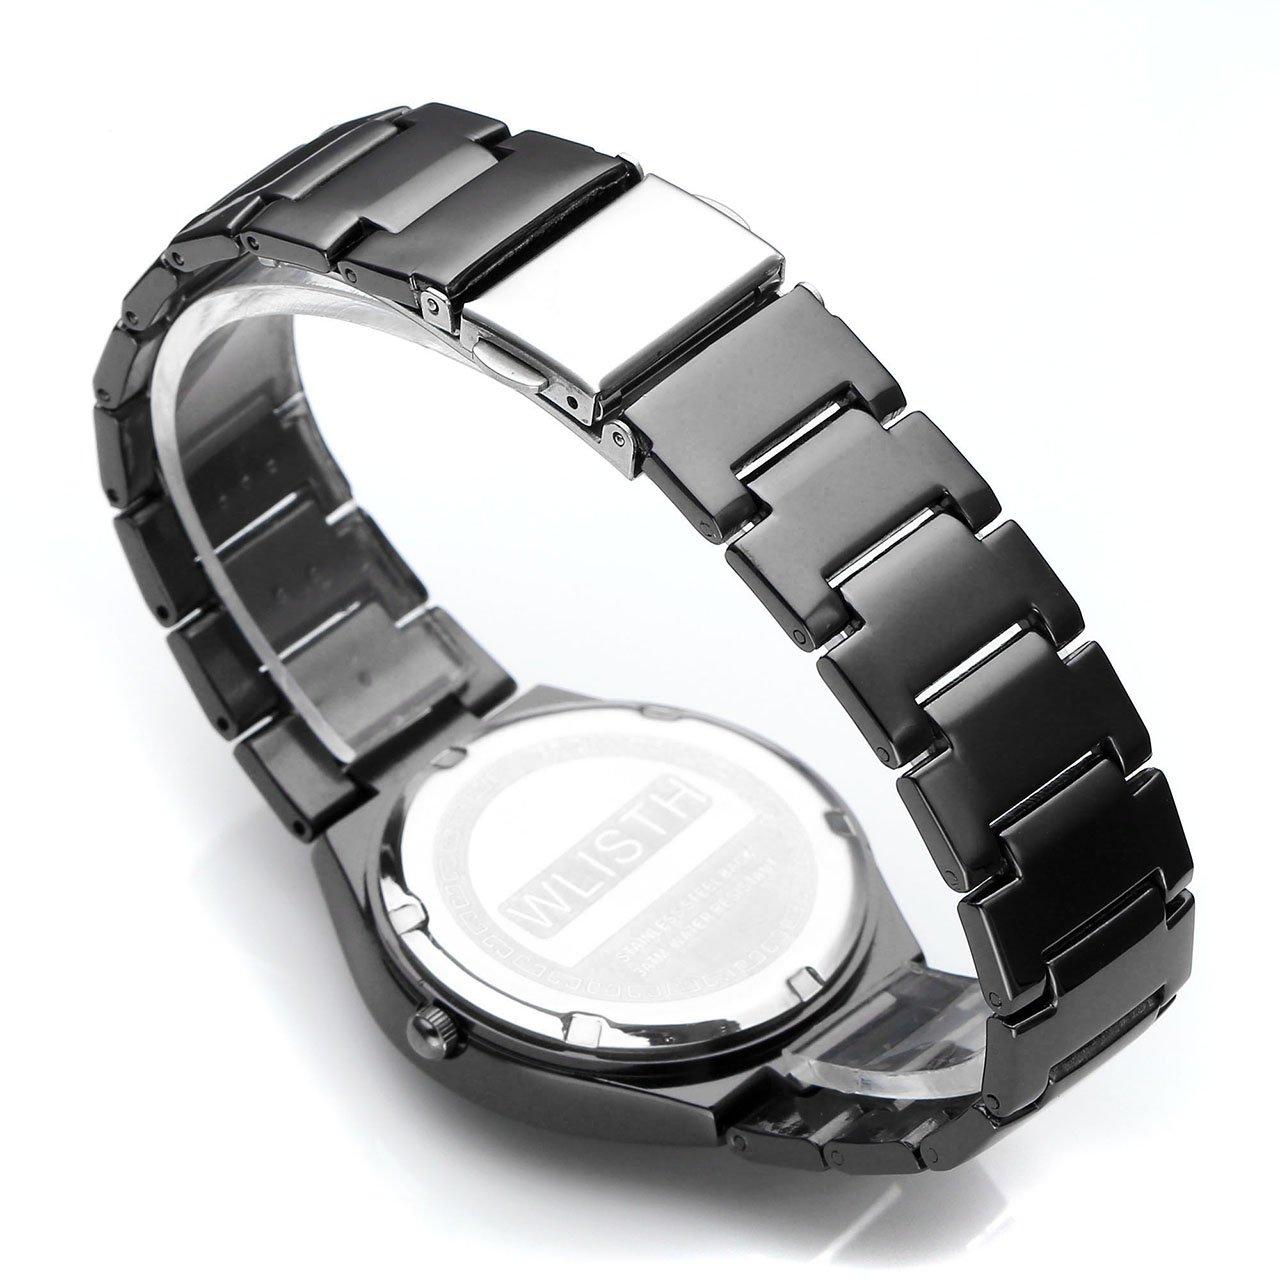 JSDDE Wrist Watch for Lovers/Couples Dress Wrist Analog Quartz Waterproof Business Casual Calendar Date Window, 98FT 30M 3ATM Water Resistant - Black